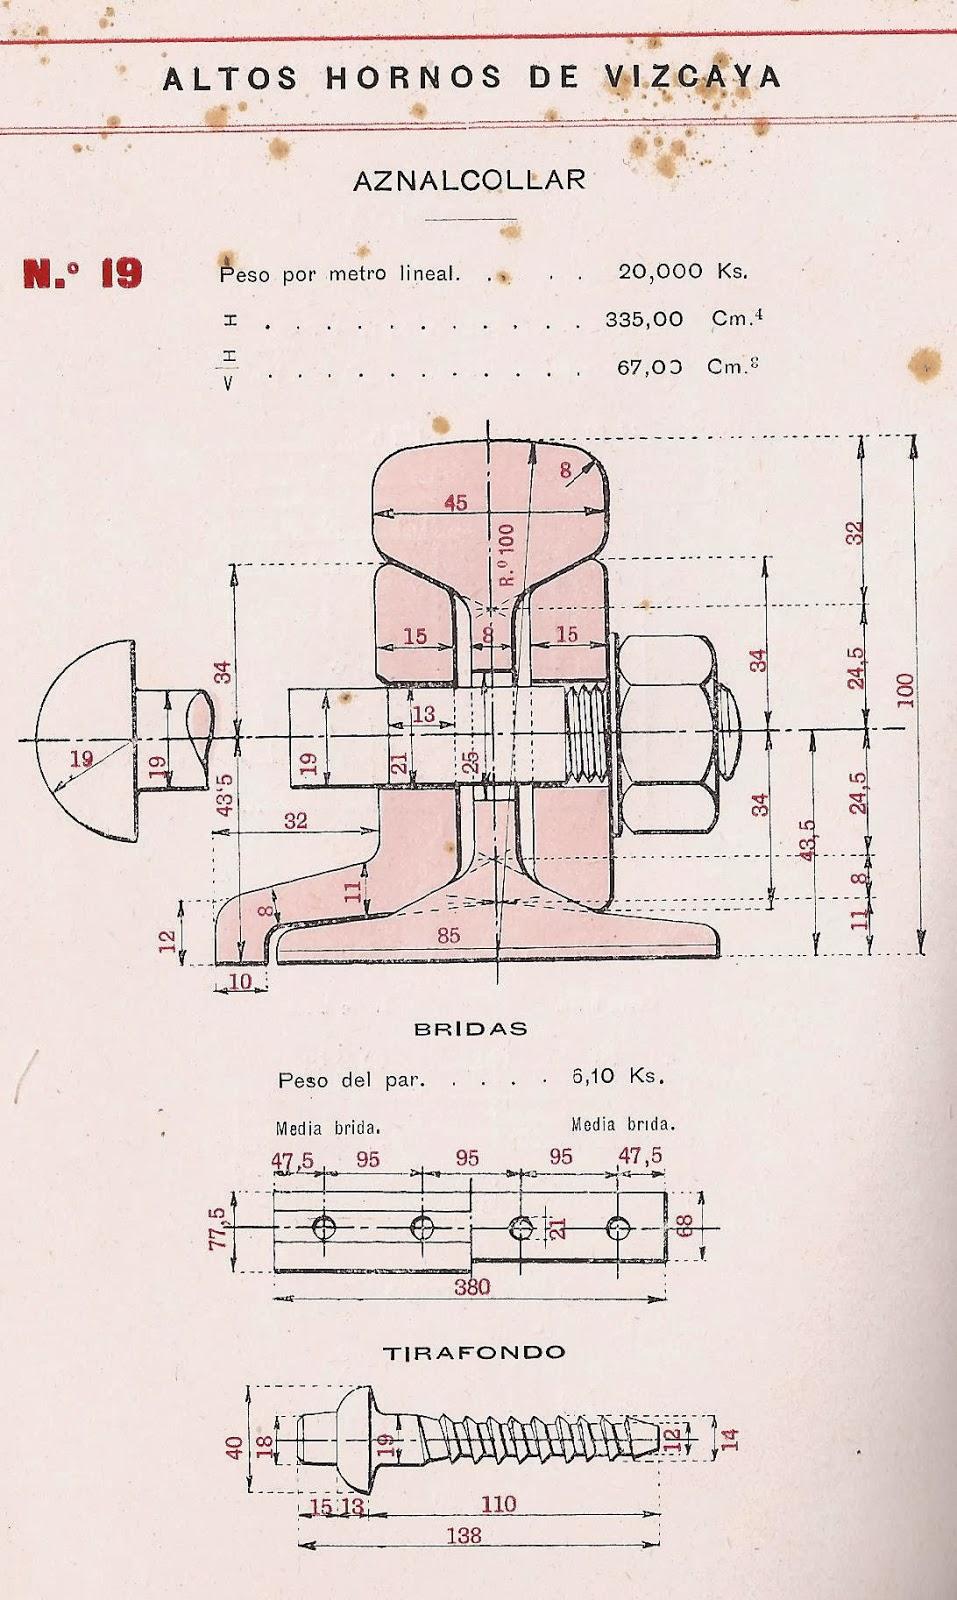 Carril 20 kilos Aznalcollar, archivo Euskotren